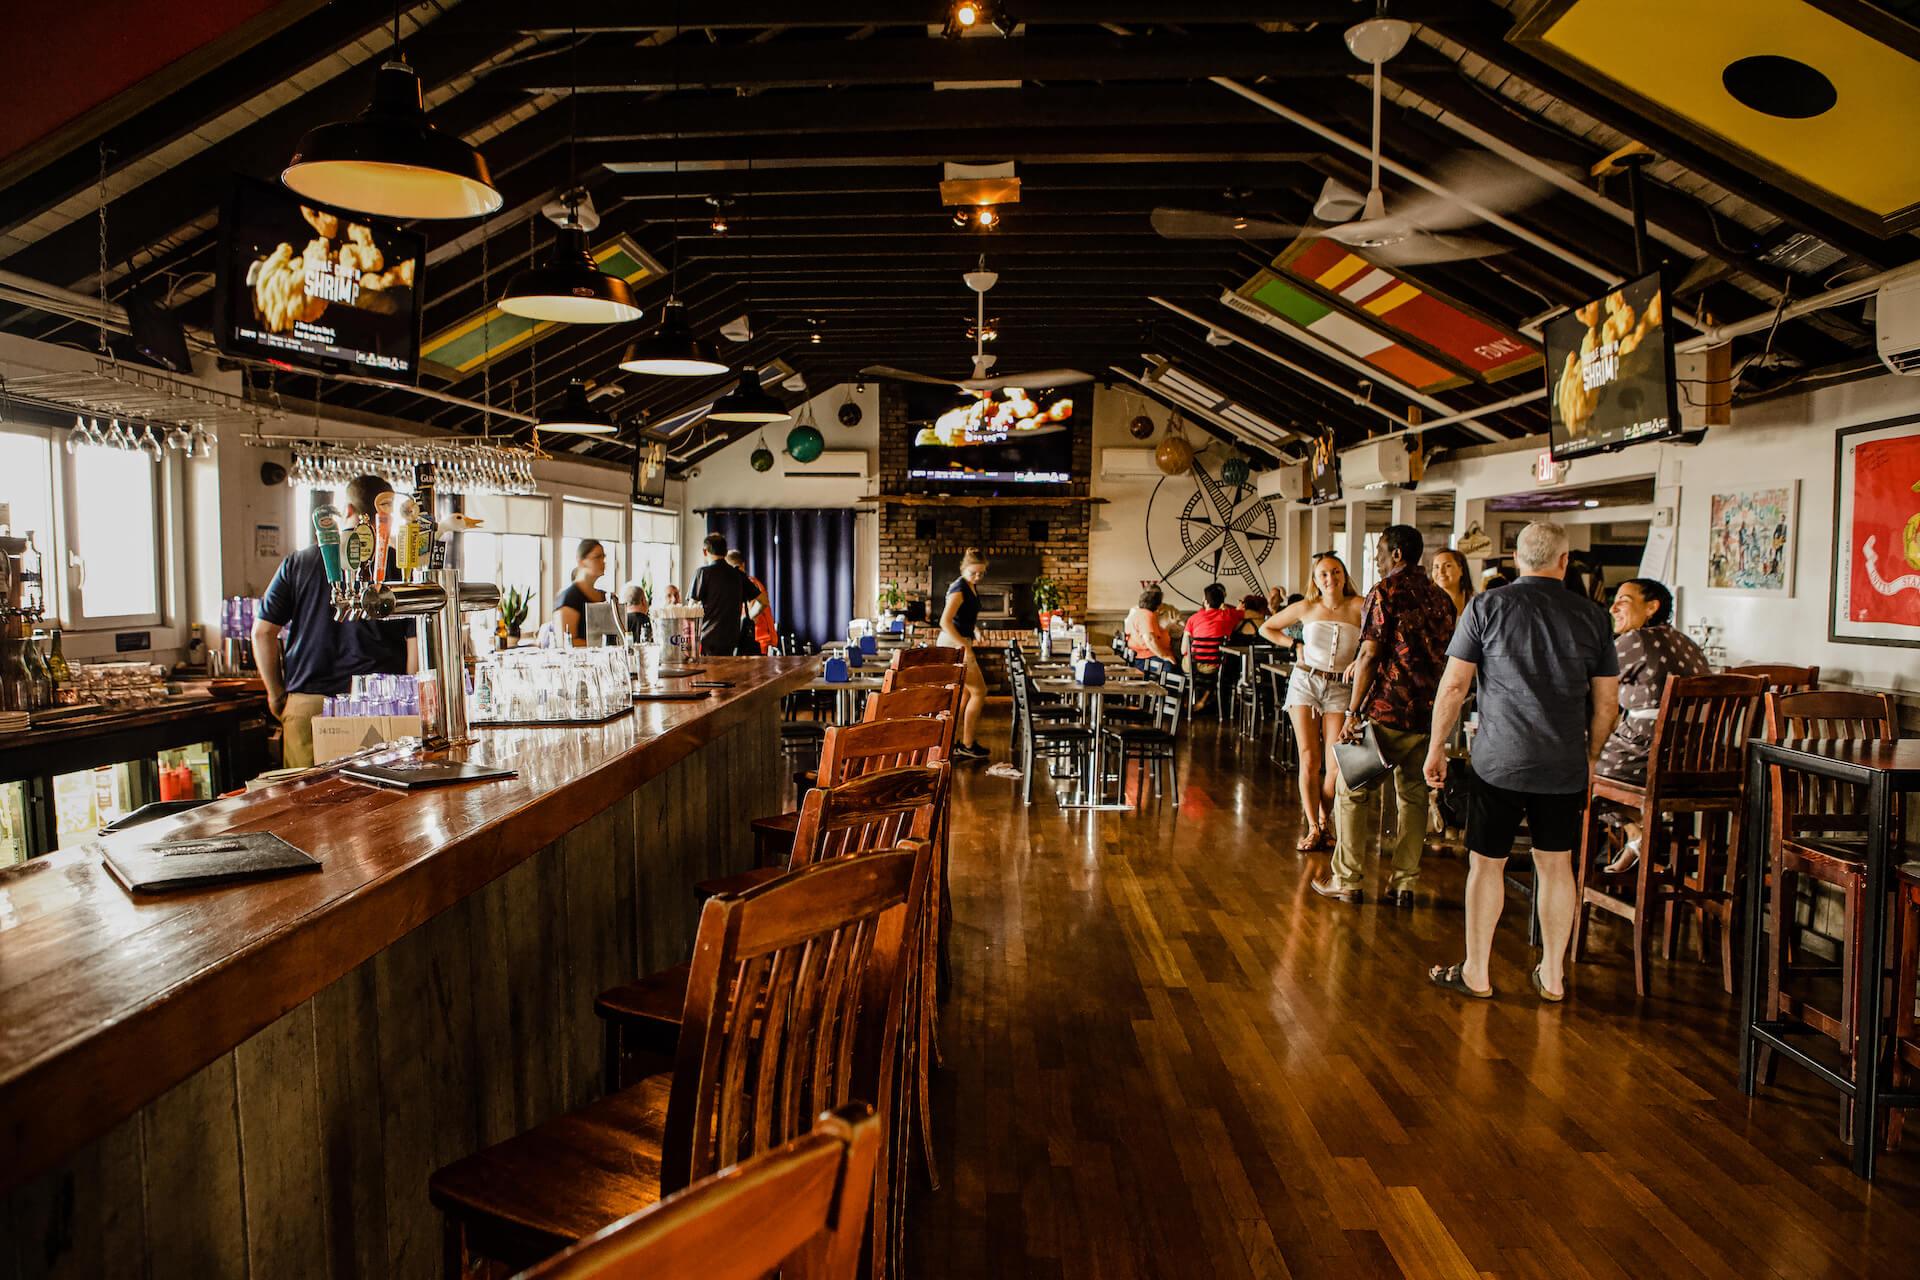 Bungalow Bar Indoor Bar